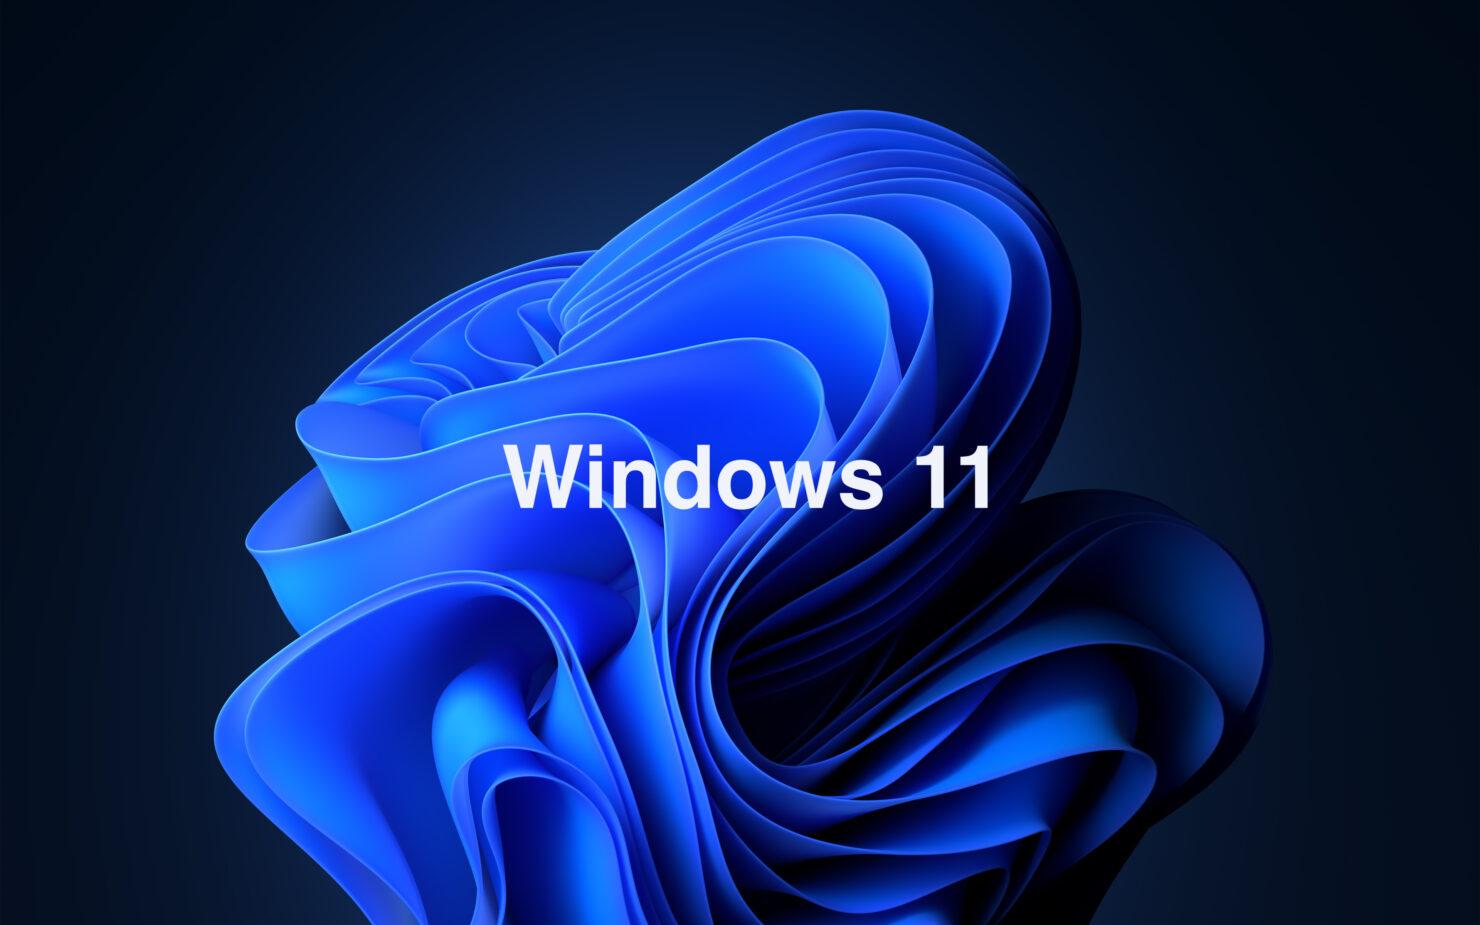 windows 11 keyboard wallpapers